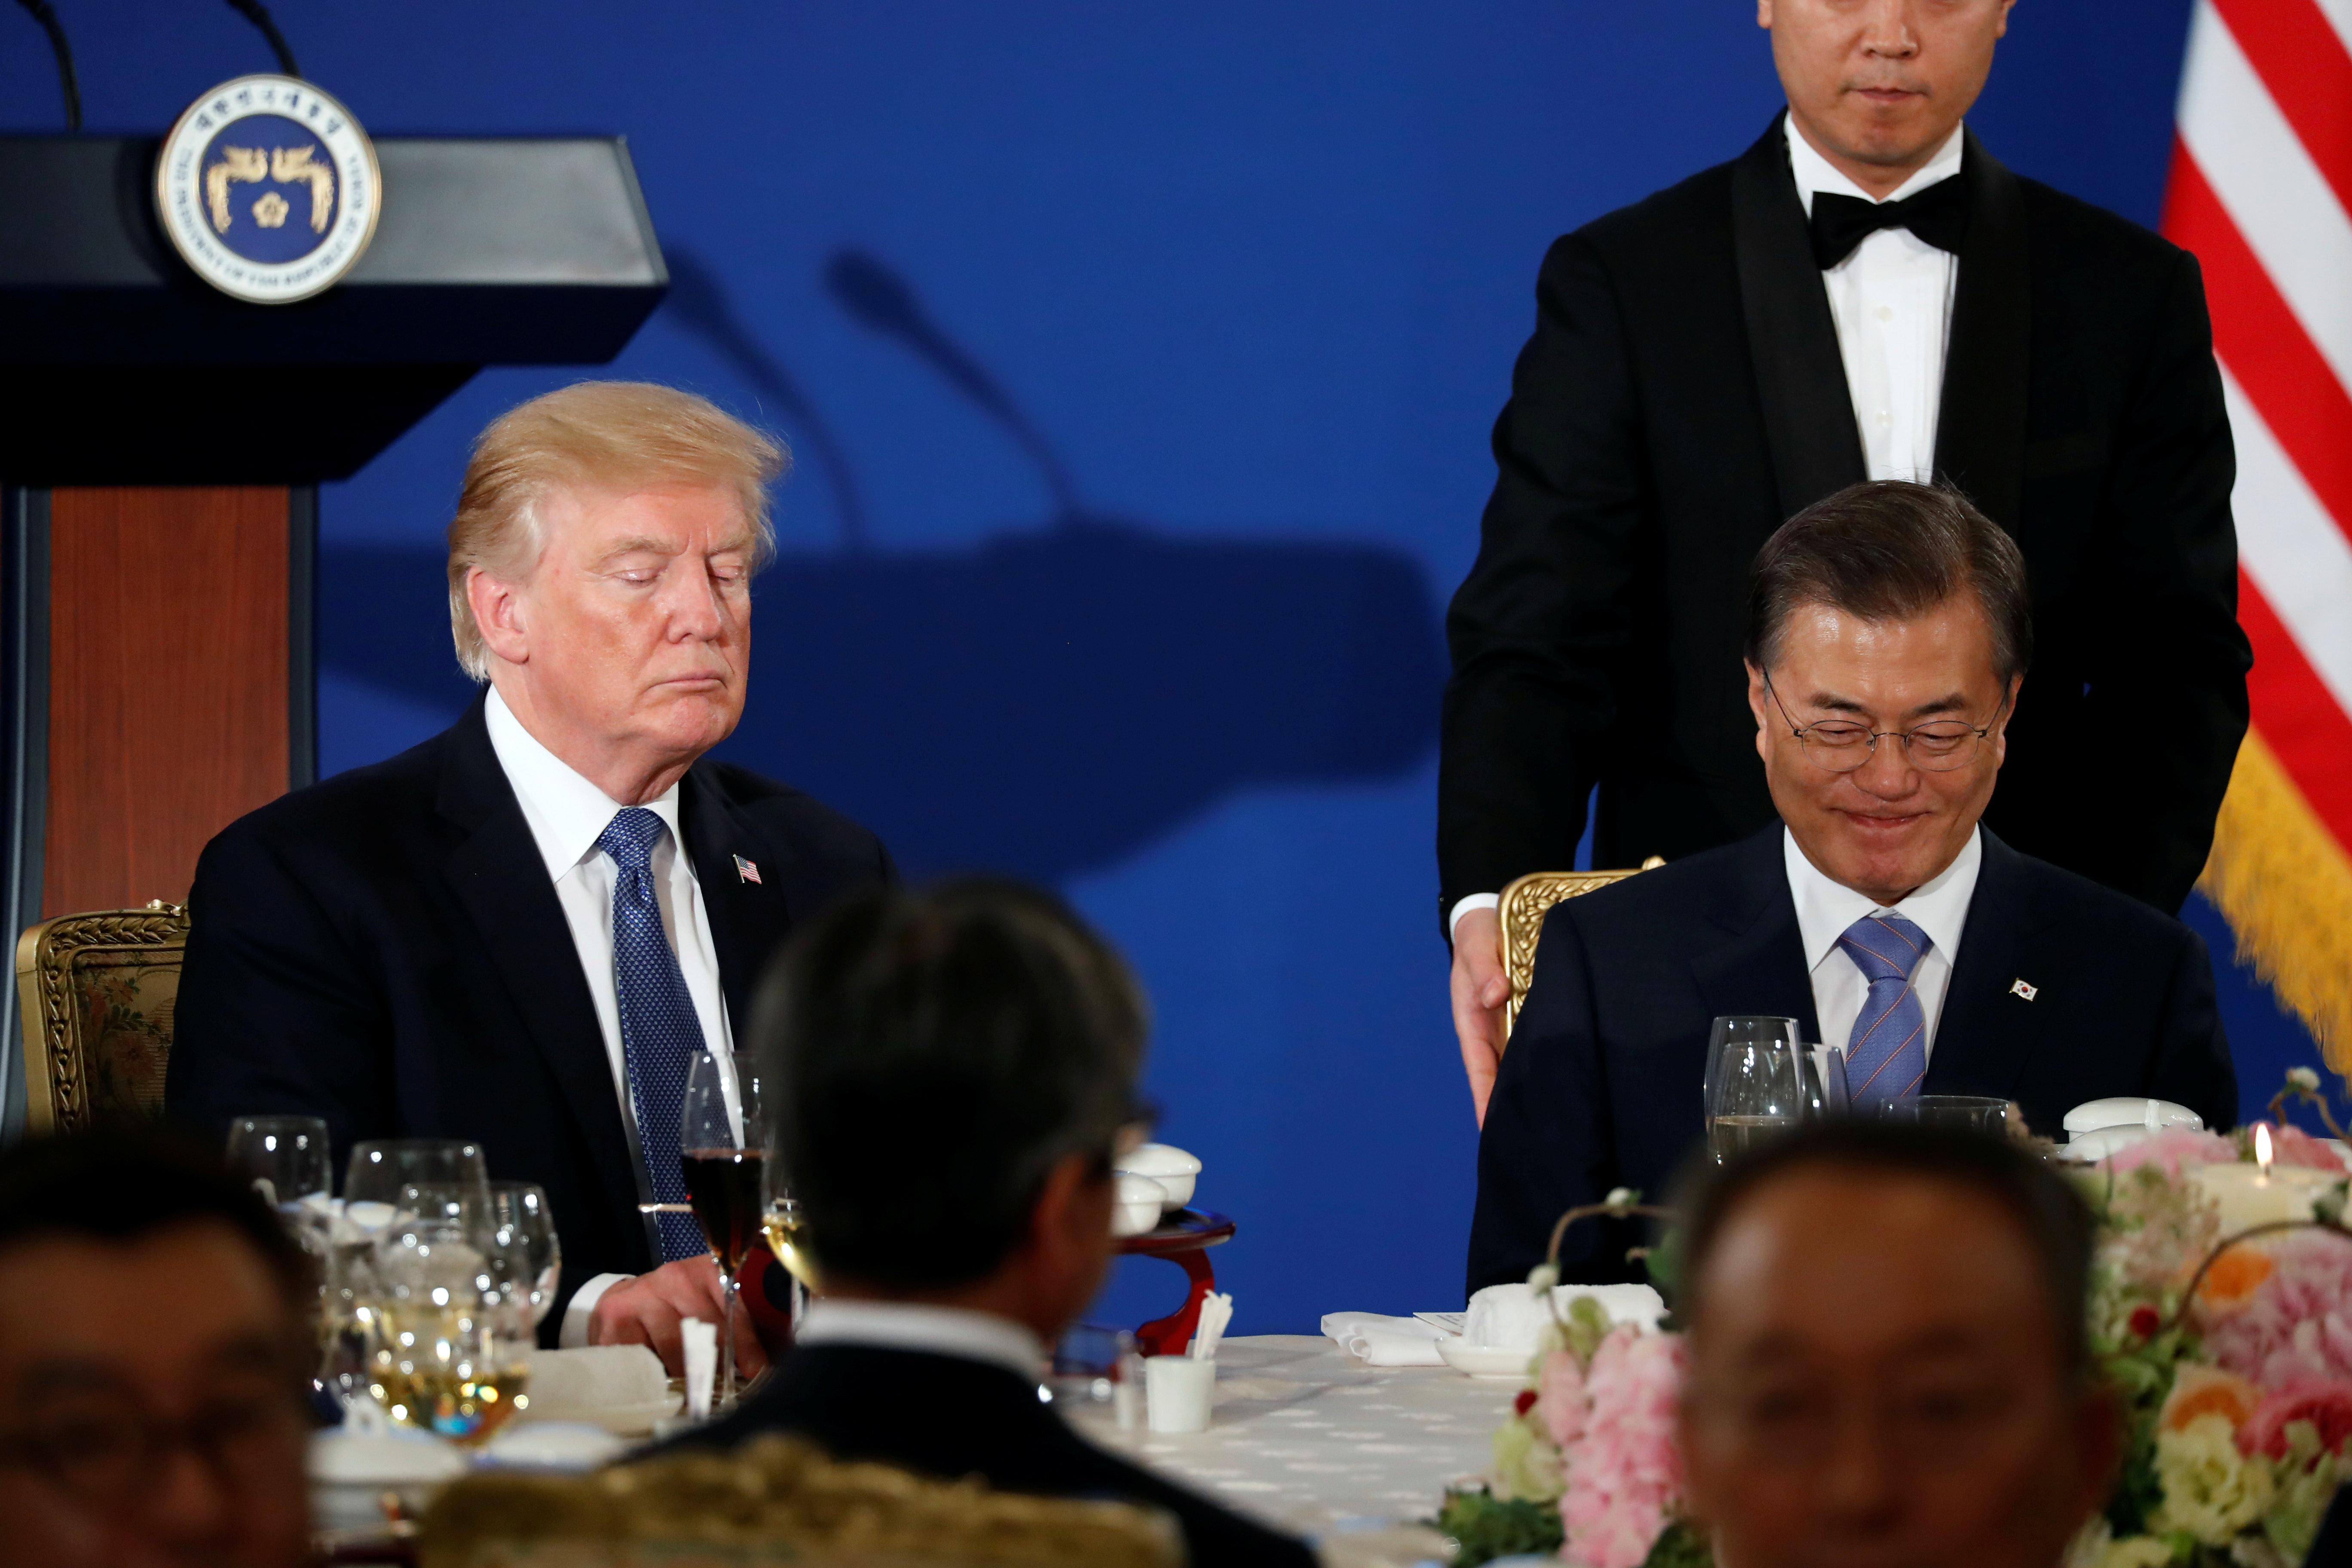 Trump hails 'possible progress' on talks with N Korea